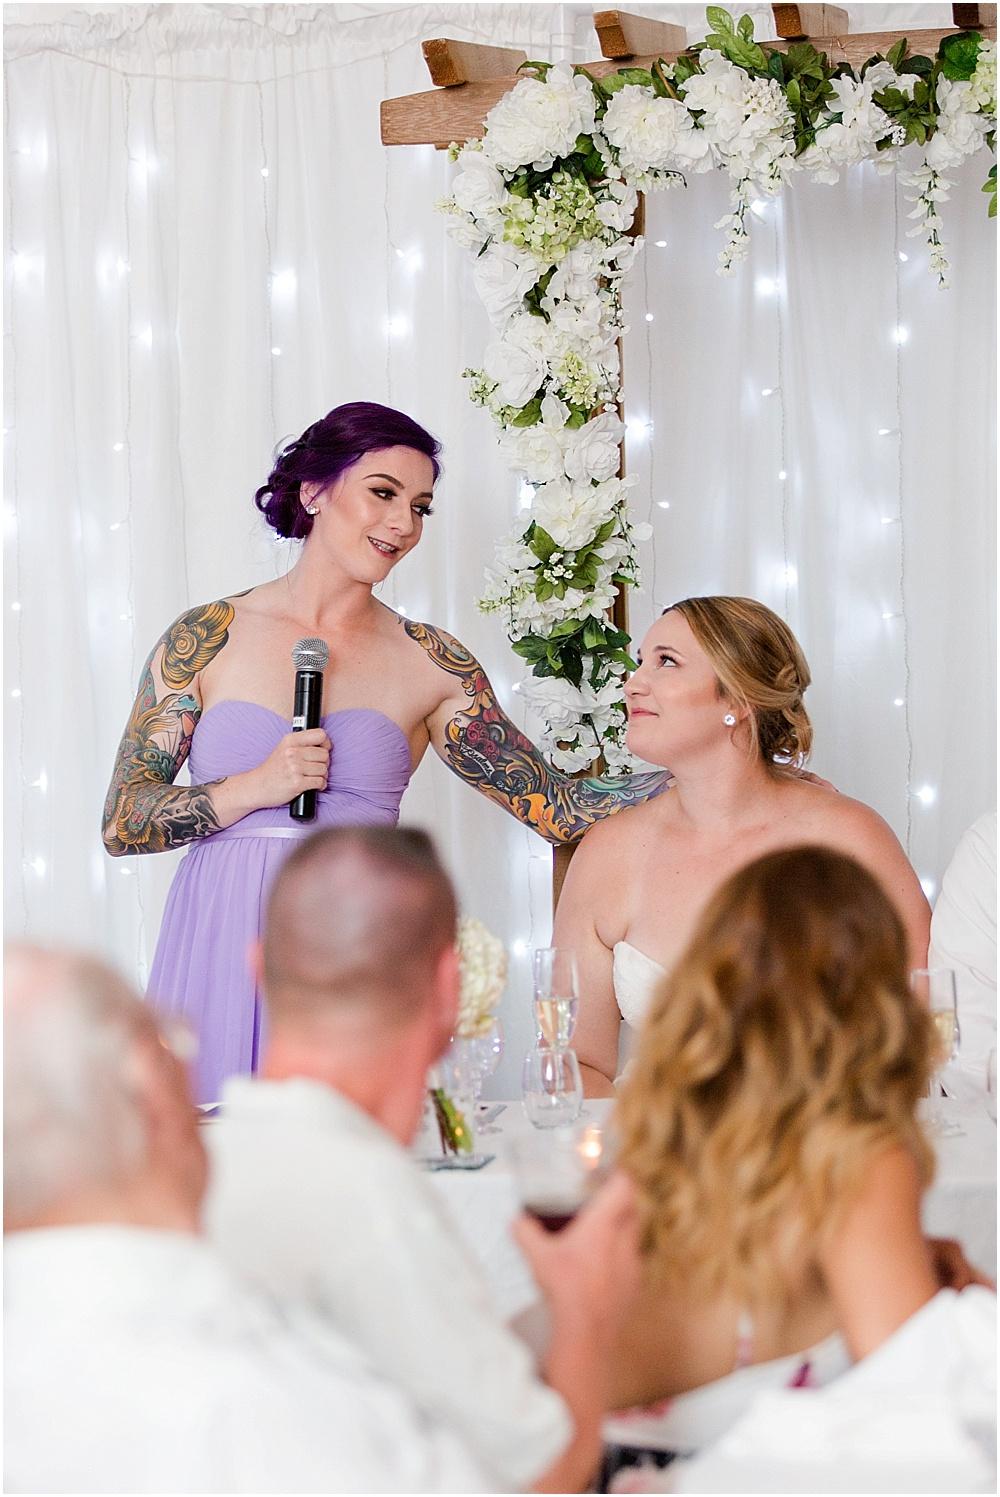 mitzner_silverdale_beach_hotel_wedding_silverdale_washington_pacific_northwest_wedding_photographer_0121